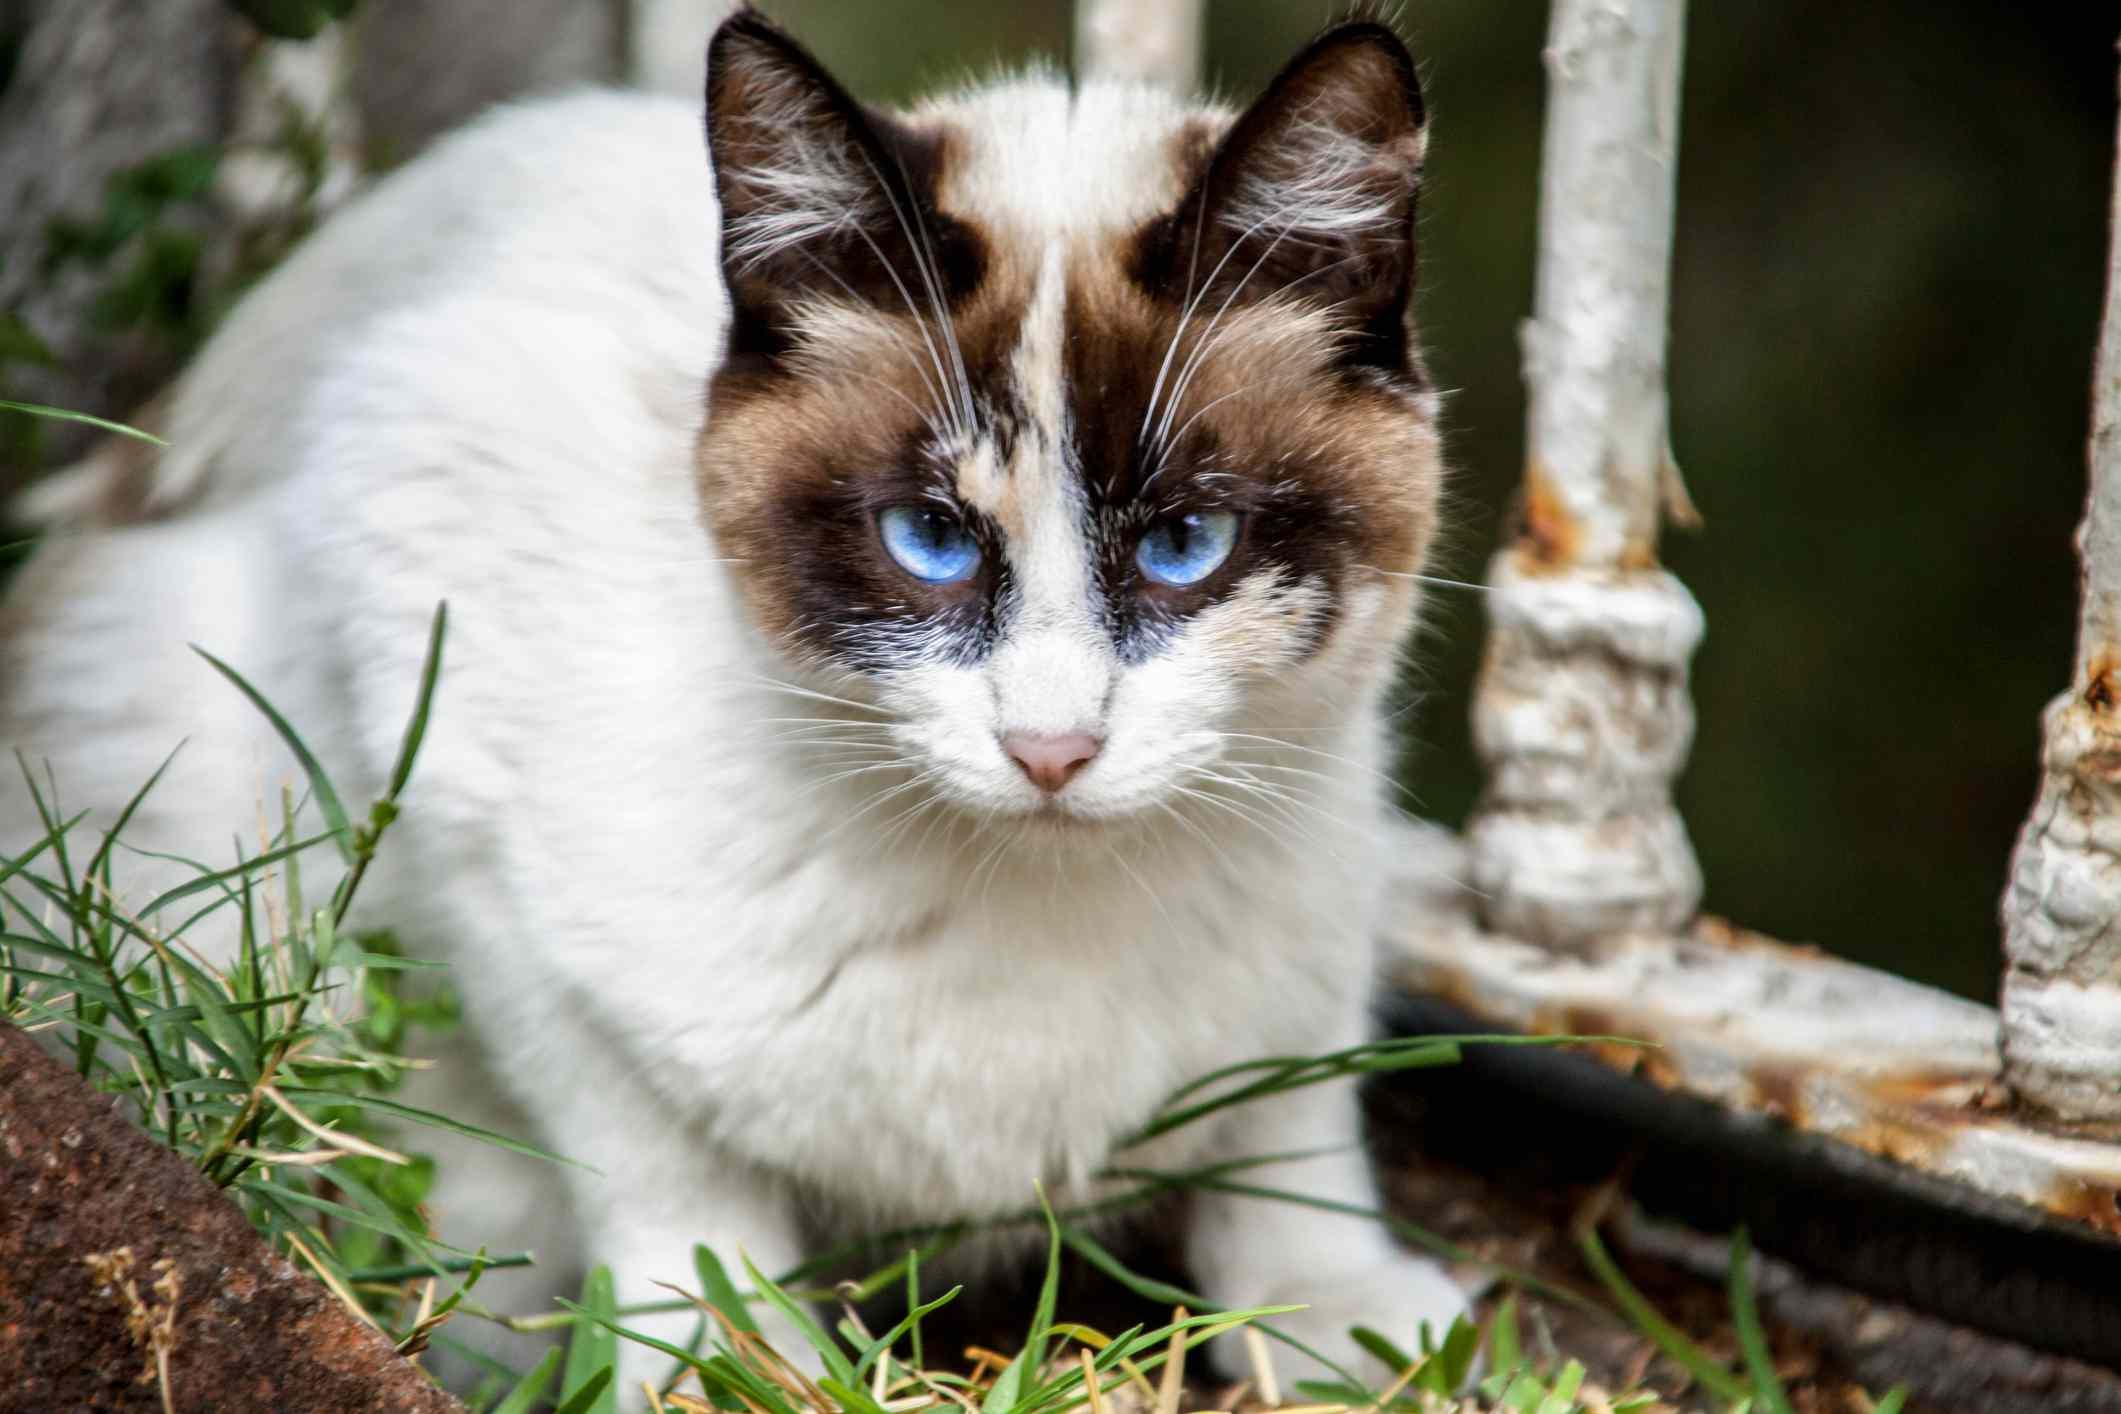 Blue-eyed snowshow cat in a garden